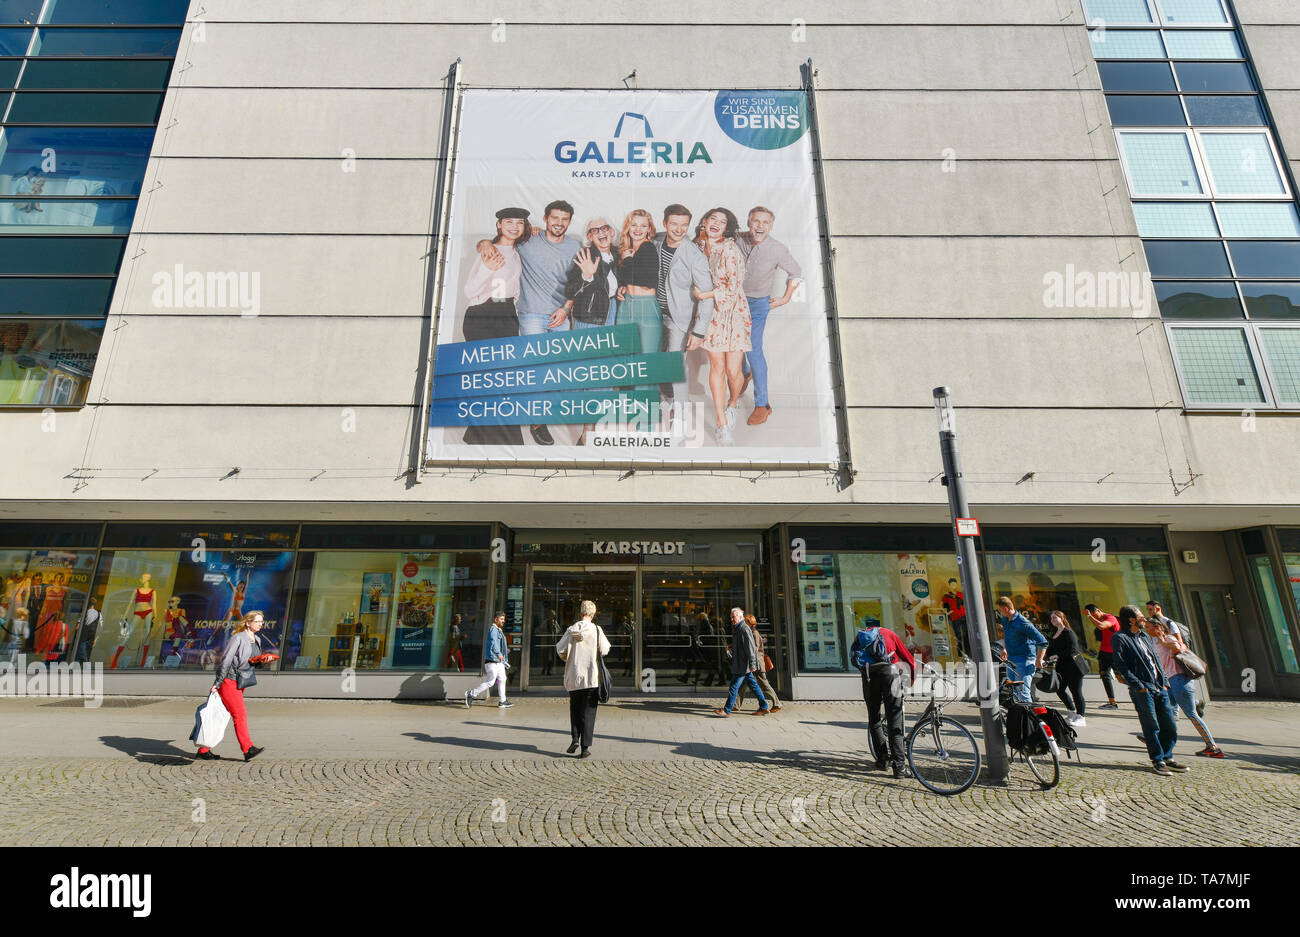 Galeria Karstadt purchase court, Carl apron street, Old Town, Spandau, Berlin, Germany, Galeria Karstadt Kaufhof, Carl-Schurz-Straße, Altstadt, Deutsc - Stock Image